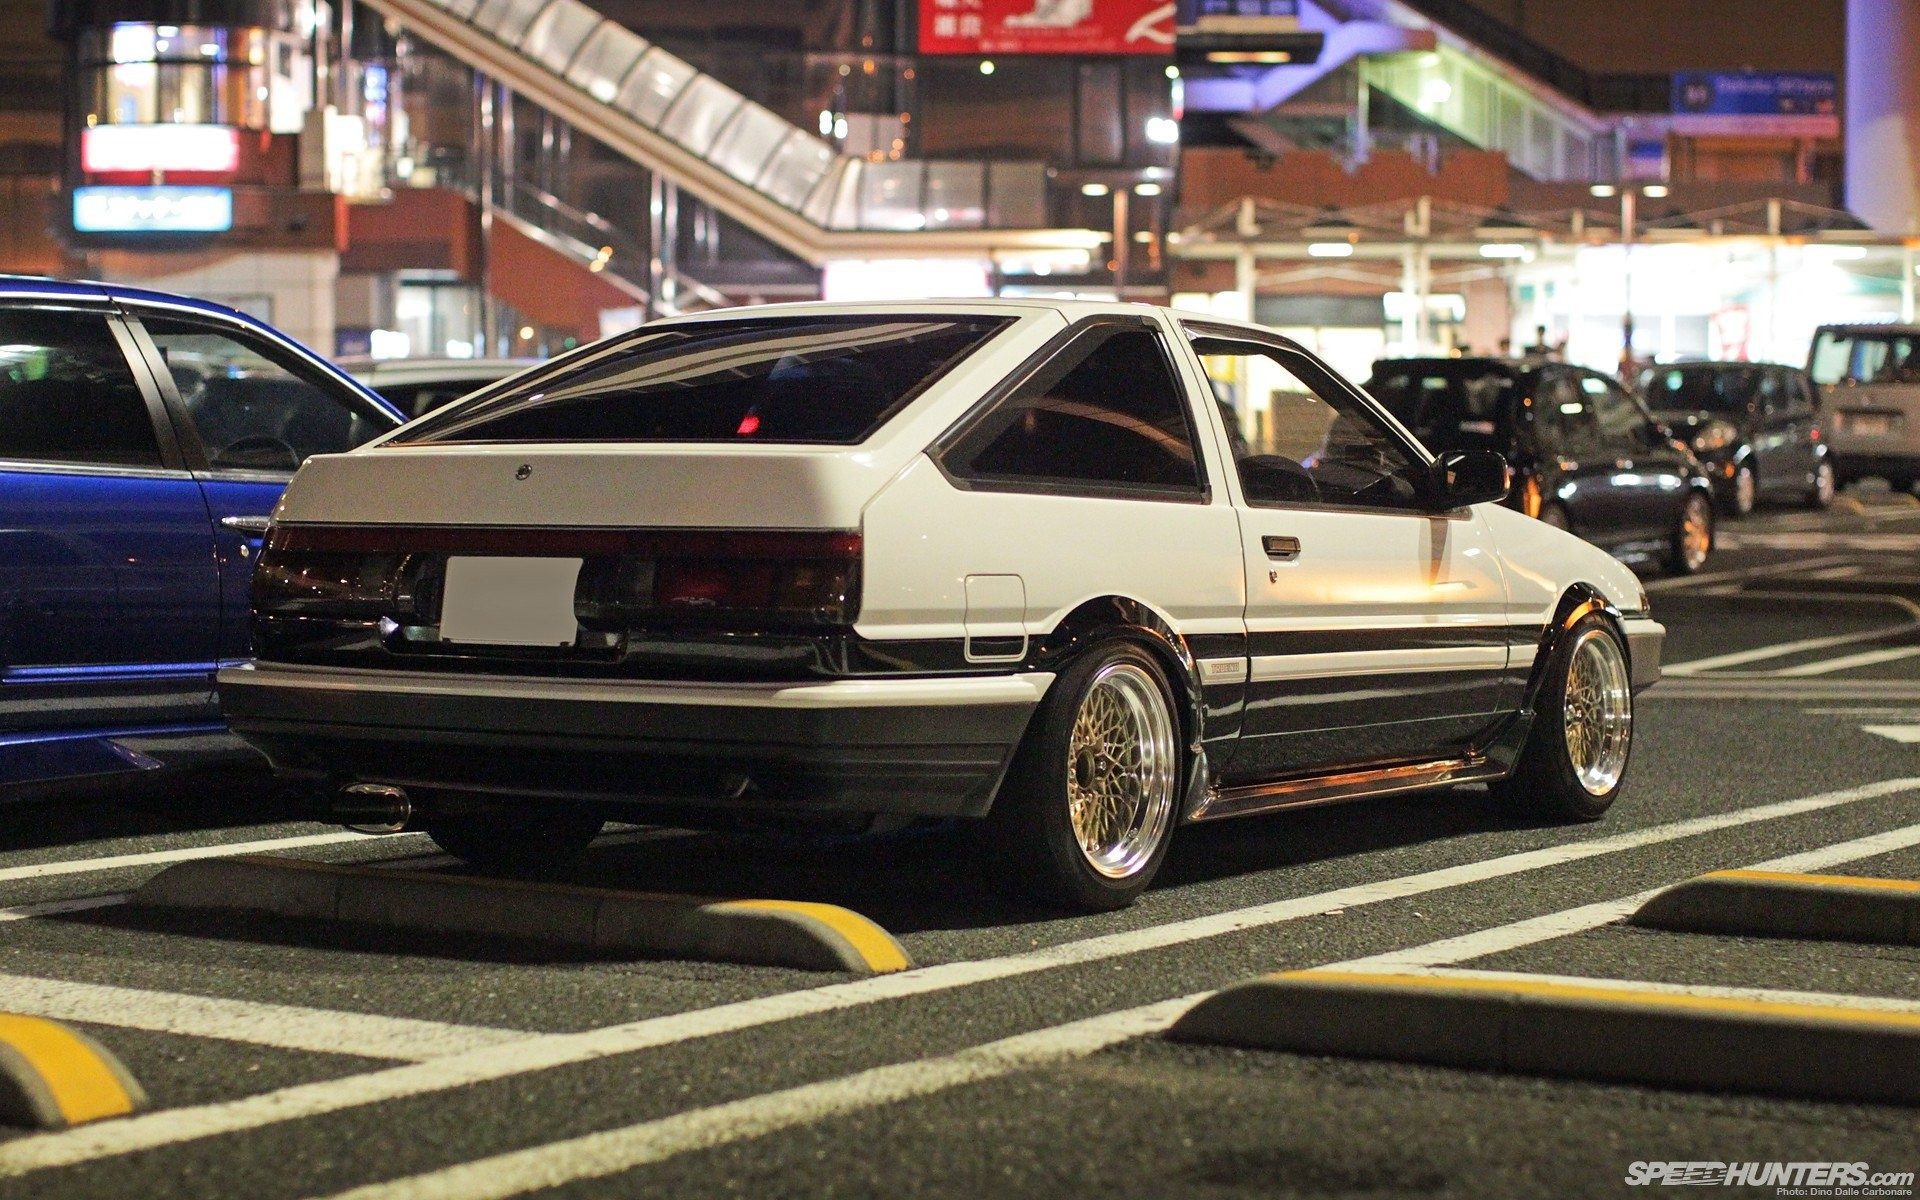 cars Toyota Corolla tuning AE86 trueno drift Speedhunters jdm day wallpaper